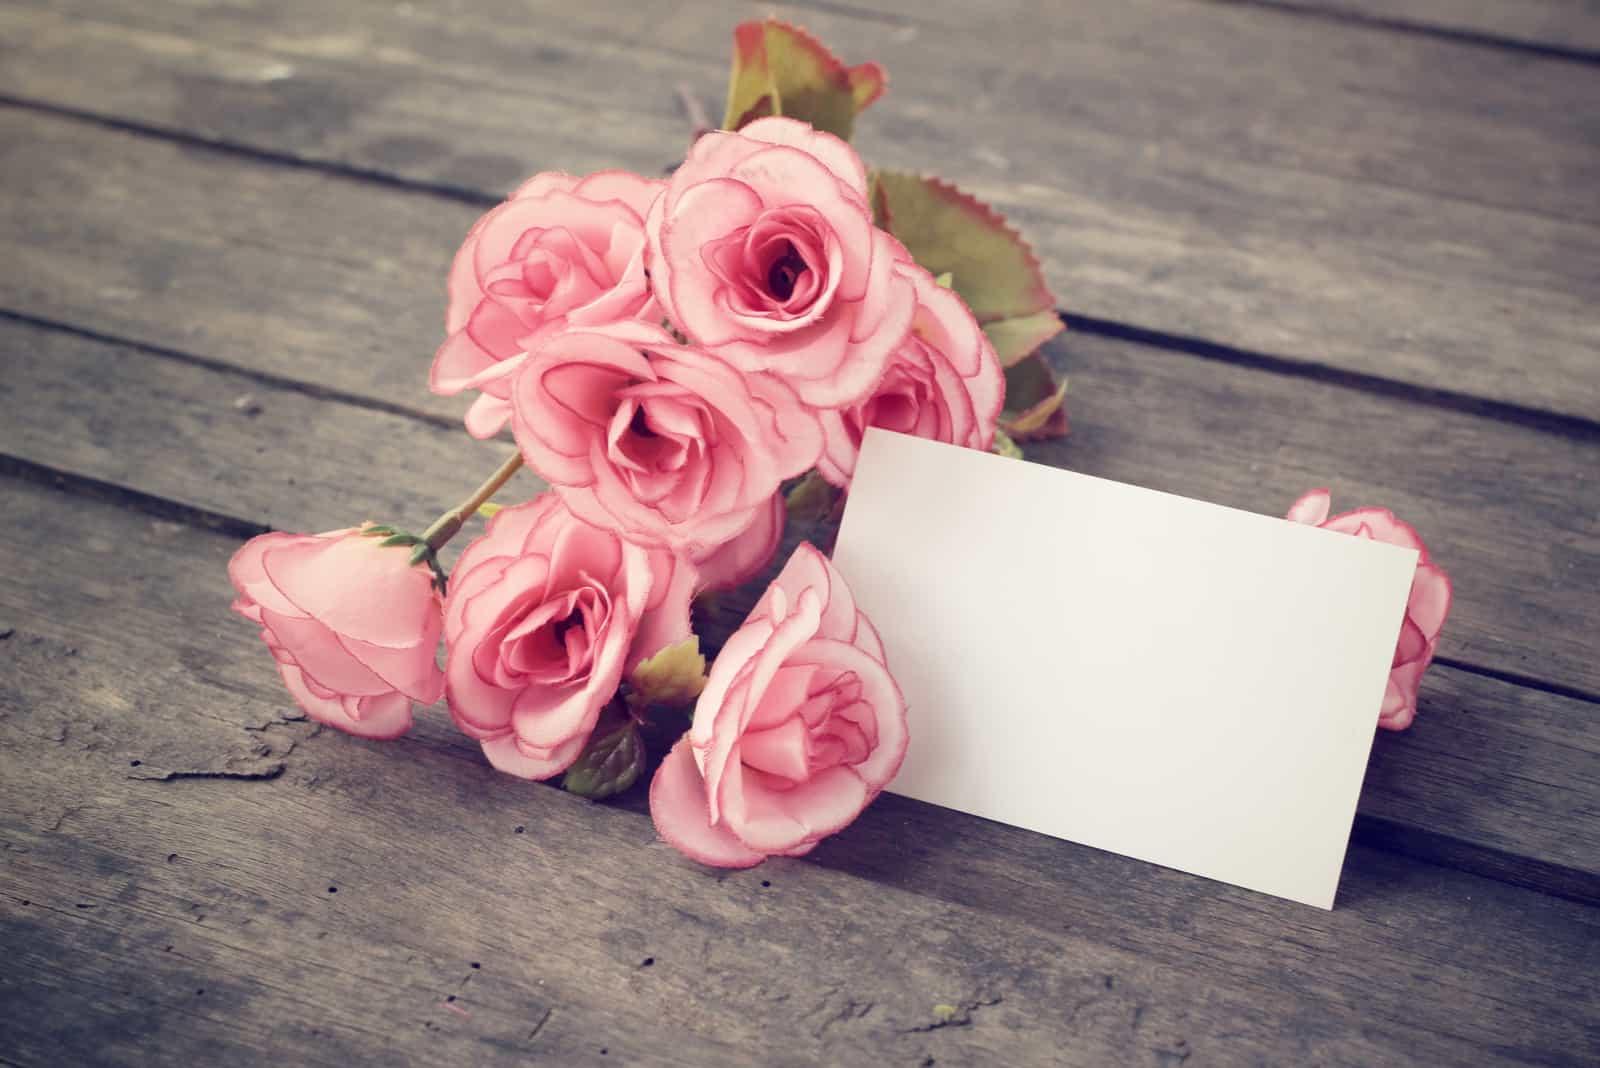 Leere Karte mit Rosen